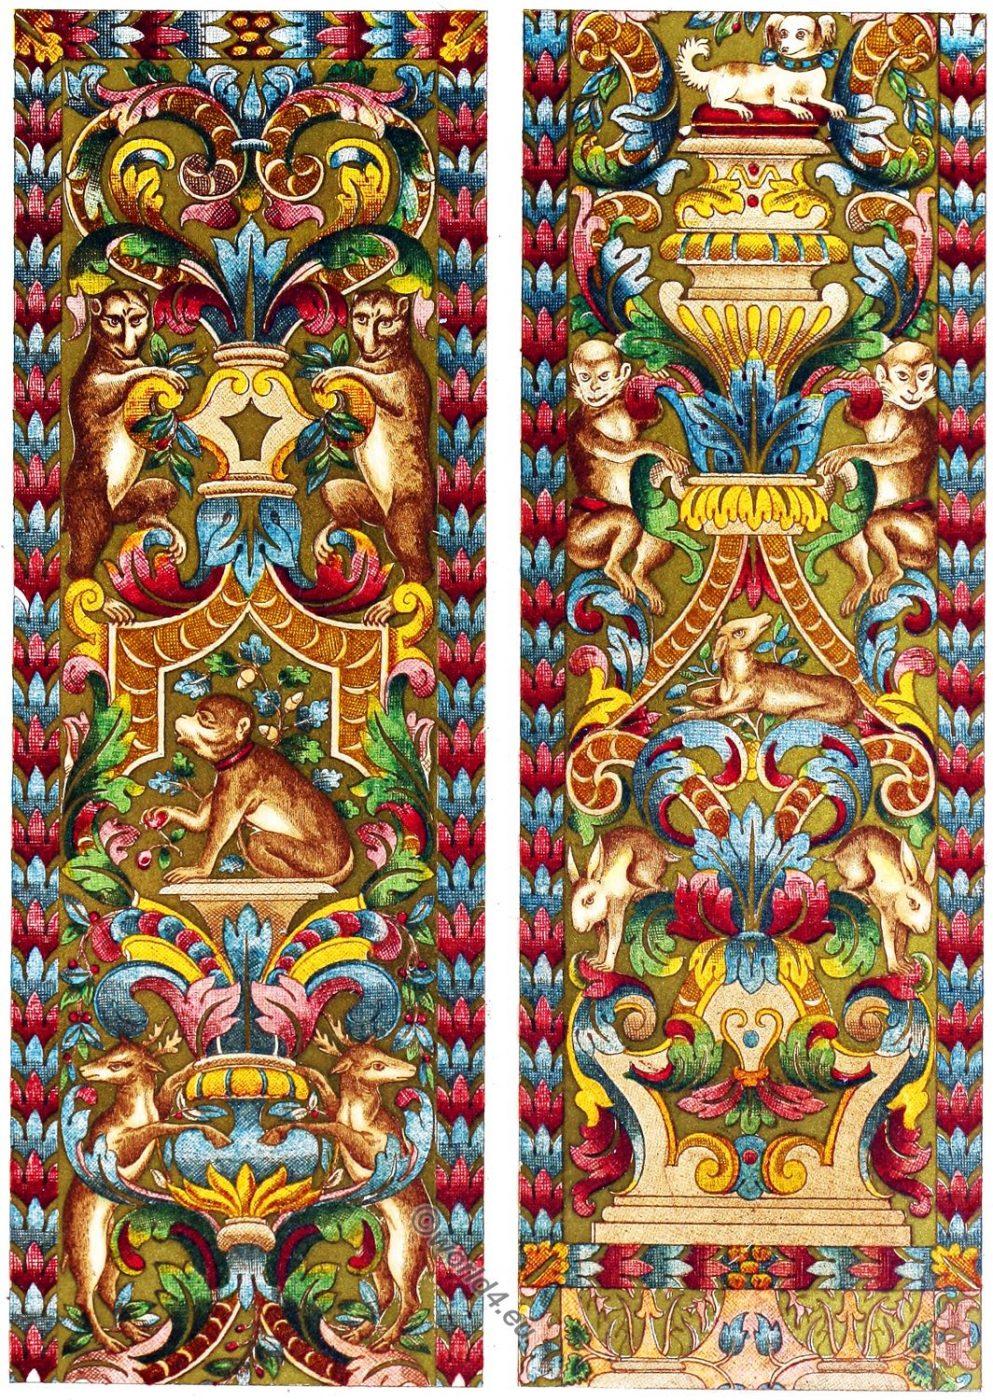 Renaissance, Italian, embroidery, silk hangings, 16th century,